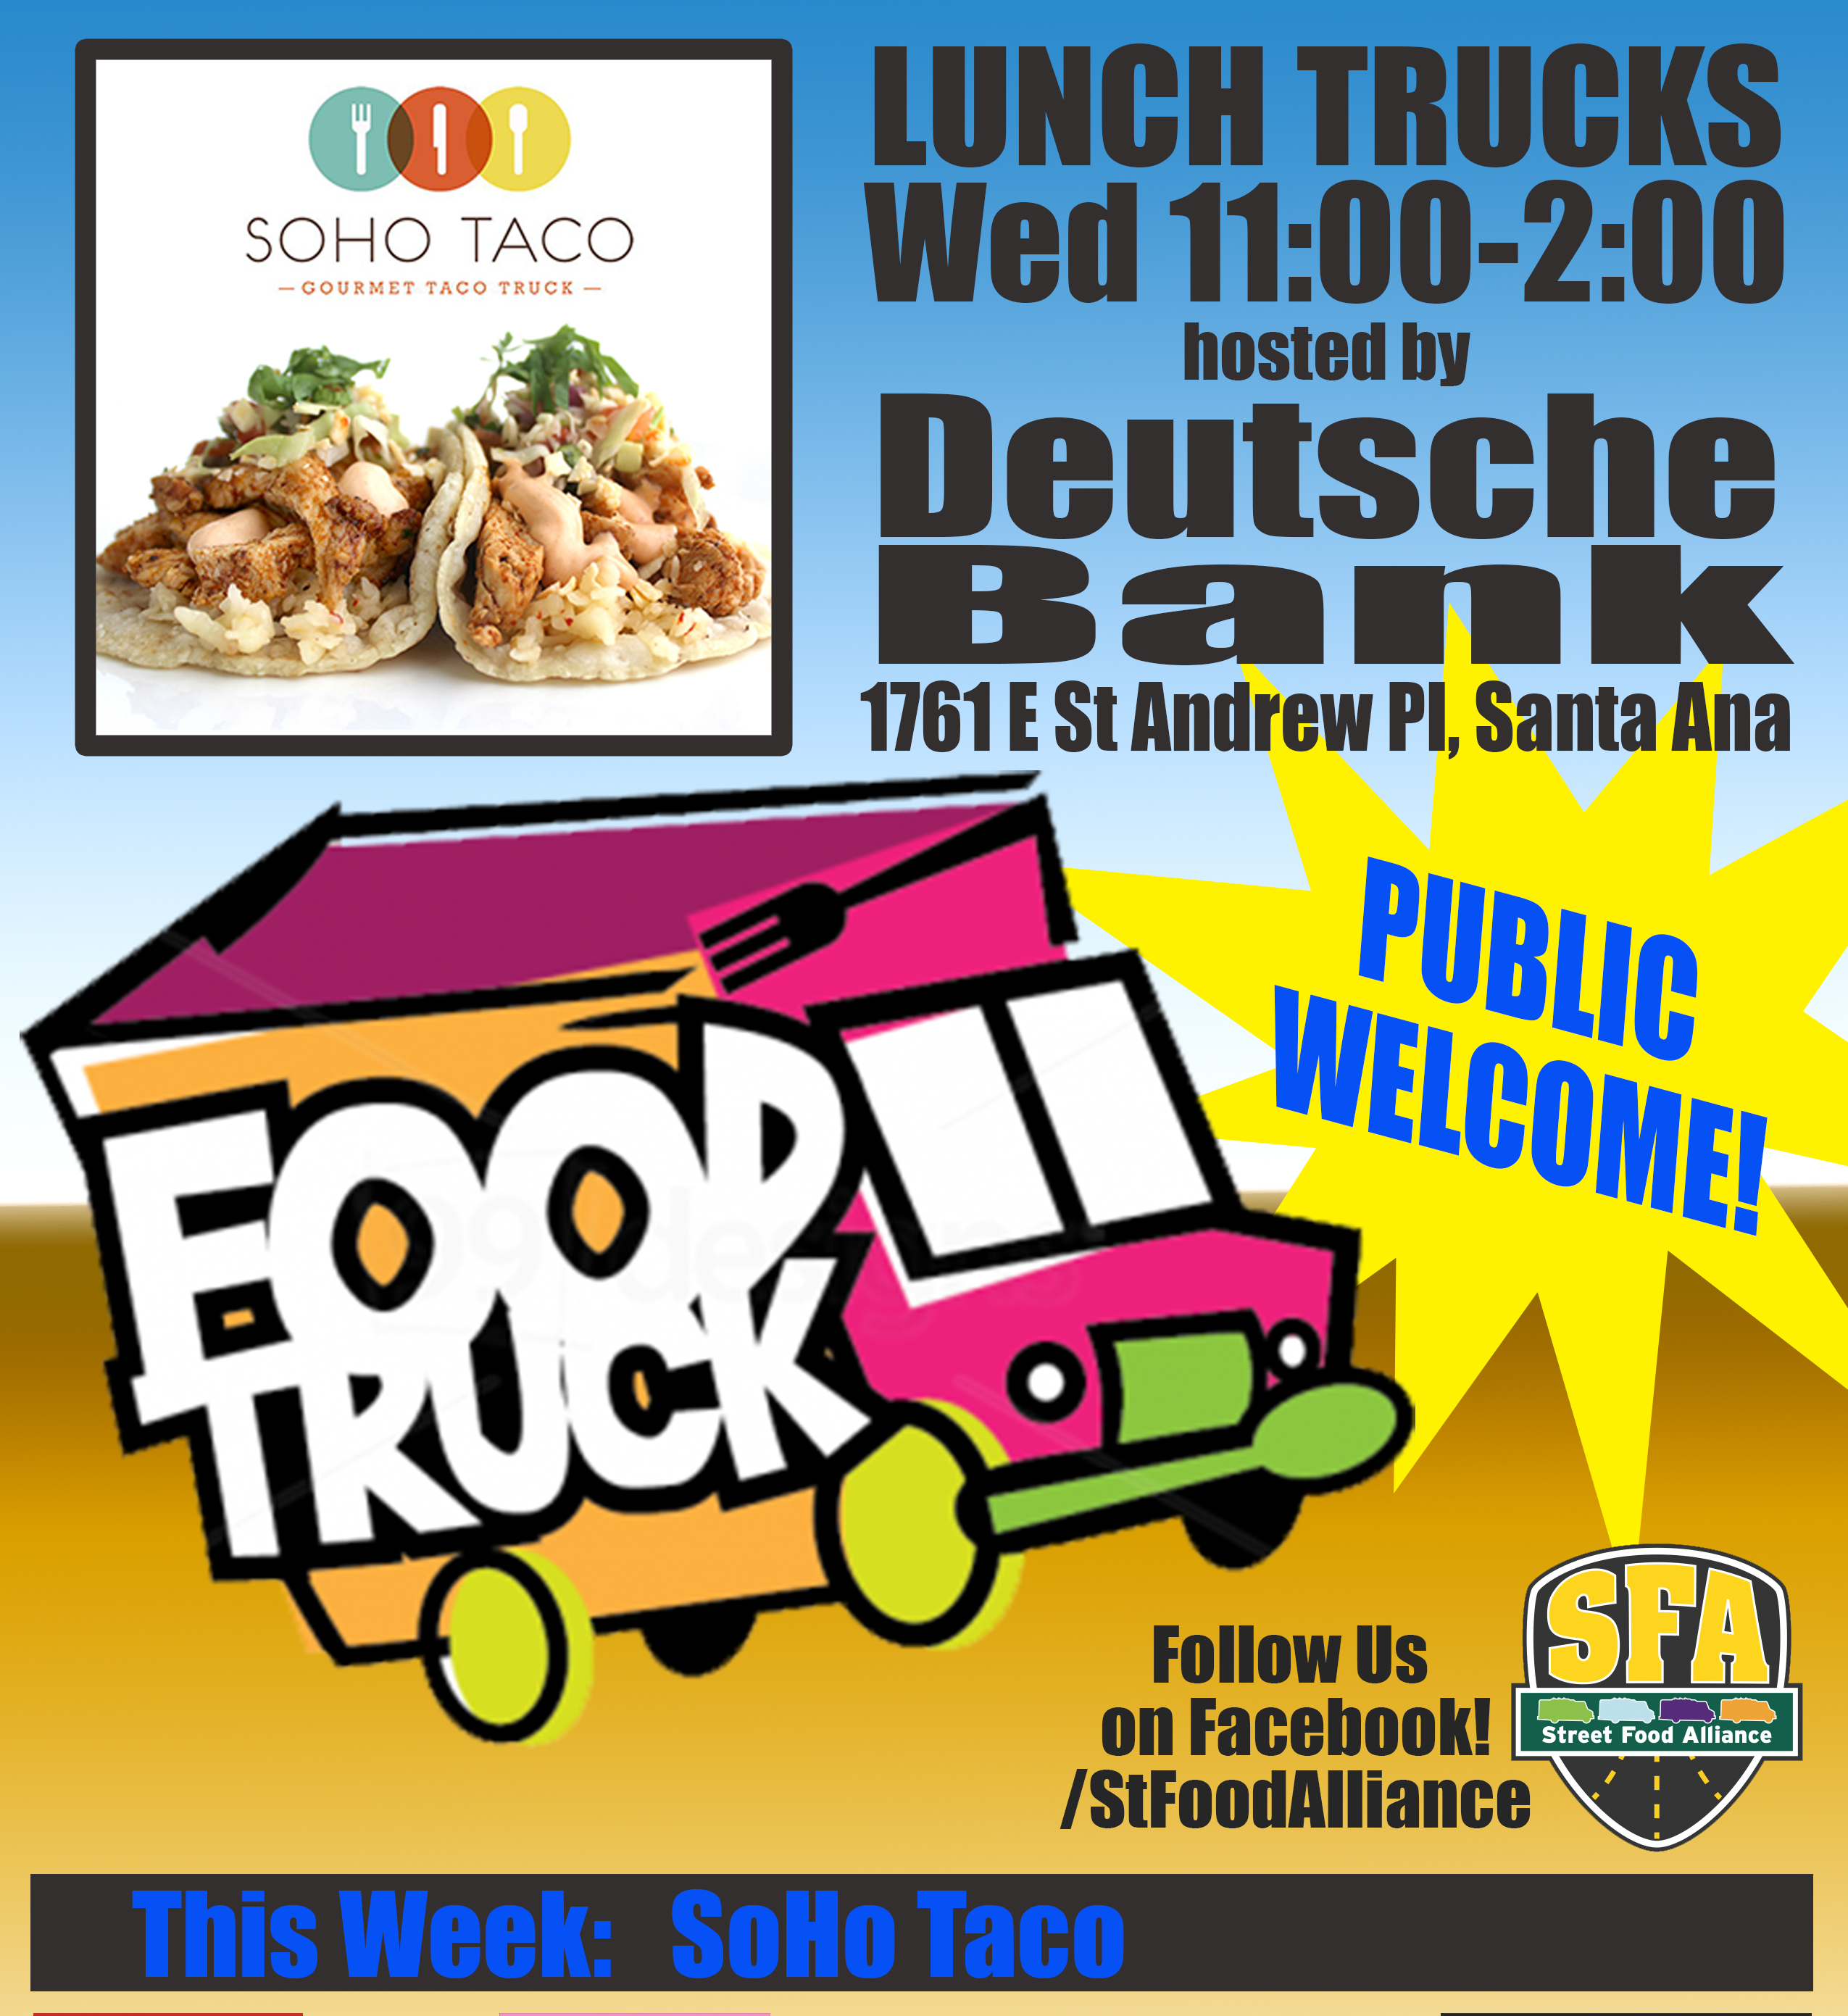 SOHO TACO Gourmet Taco Truck - Deutsche Bank - Food Trucks - Santa Ana - Official Flyer